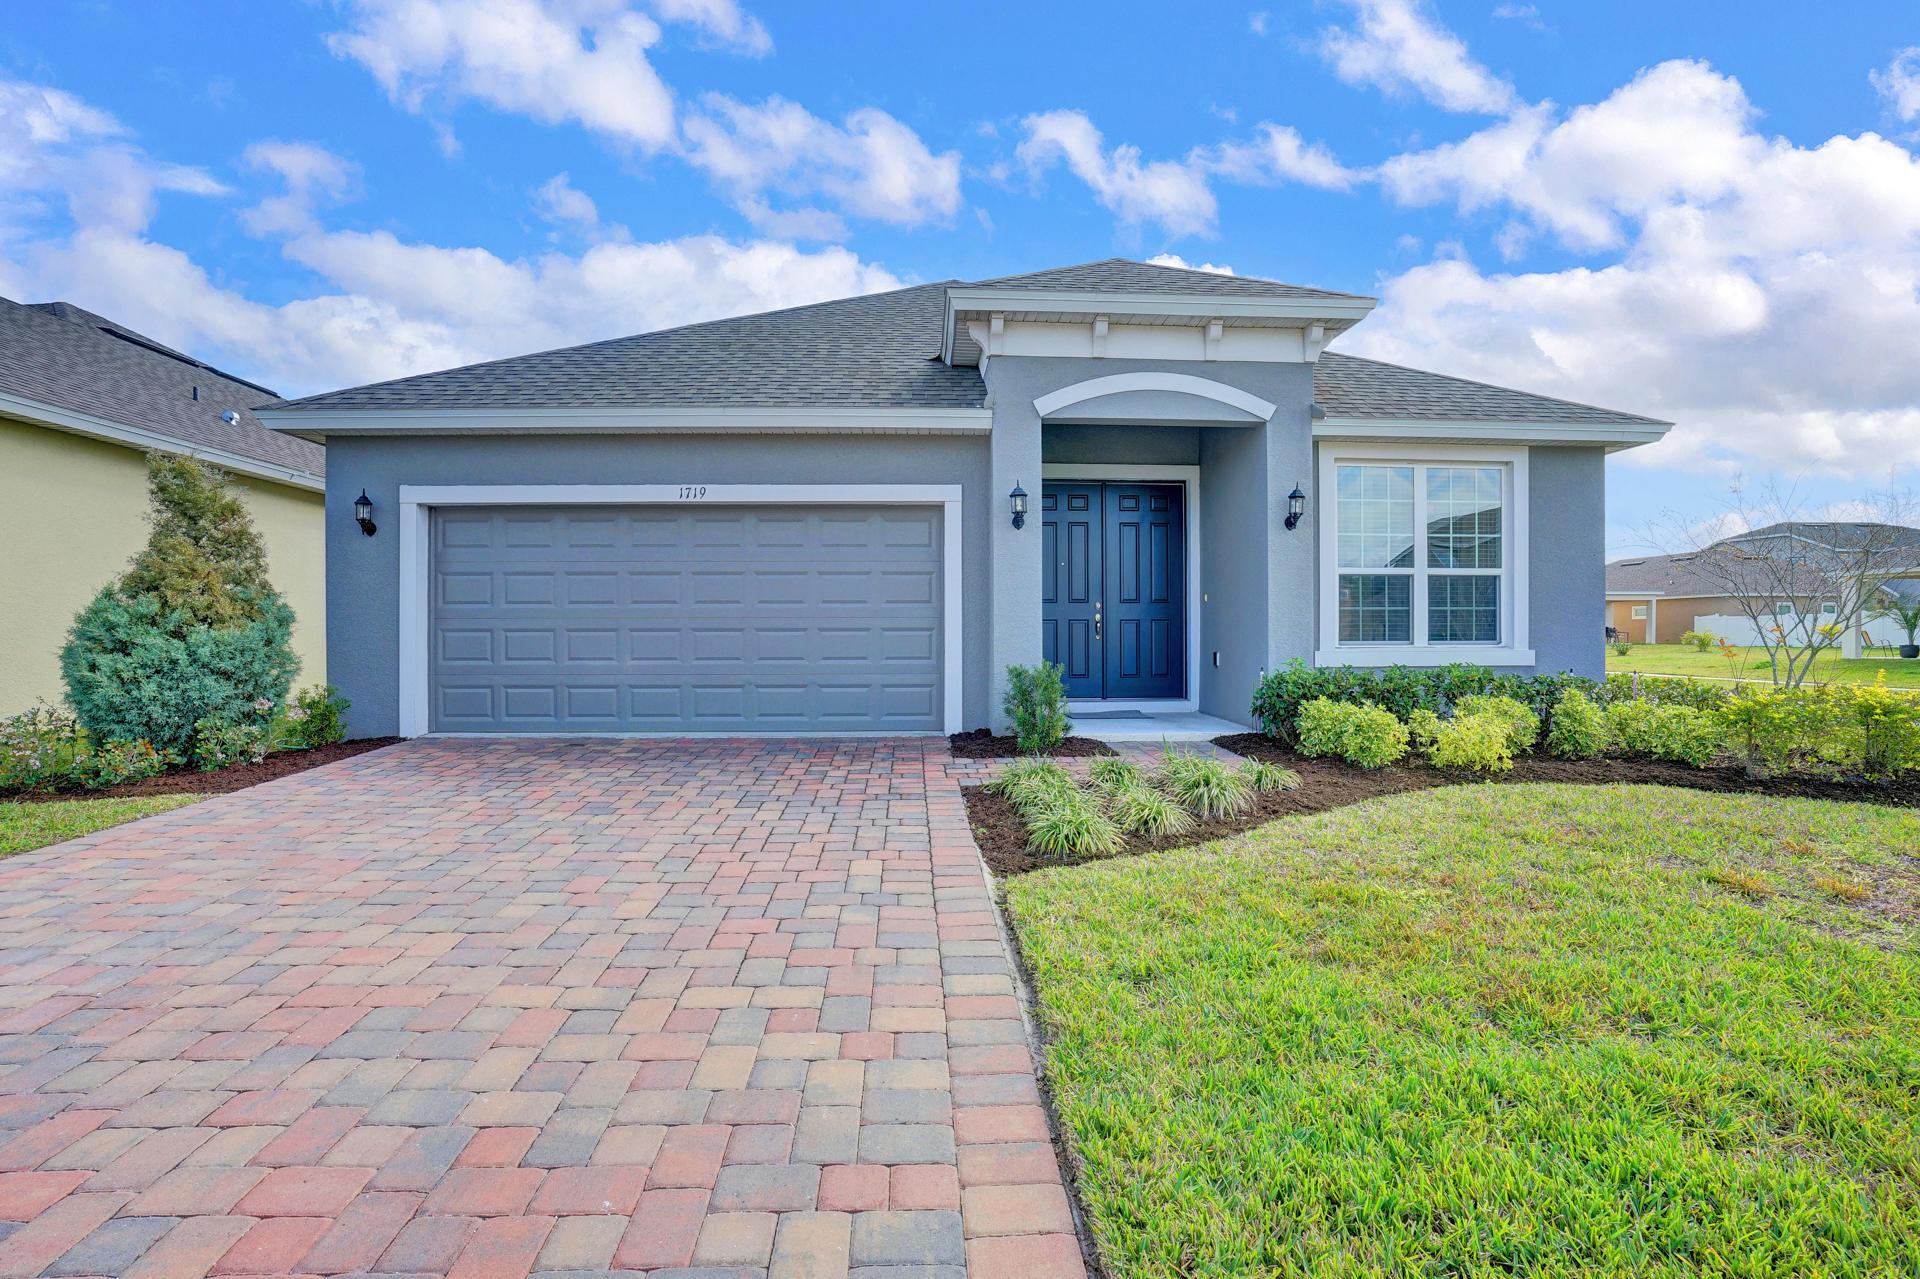 1719 Sunfish Street, St. Cloud, Florida 34771, 4 Bedrooms Bedrooms, ,2 BathroomsBathrooms,A,Single family,Sunfish,RX-10611683